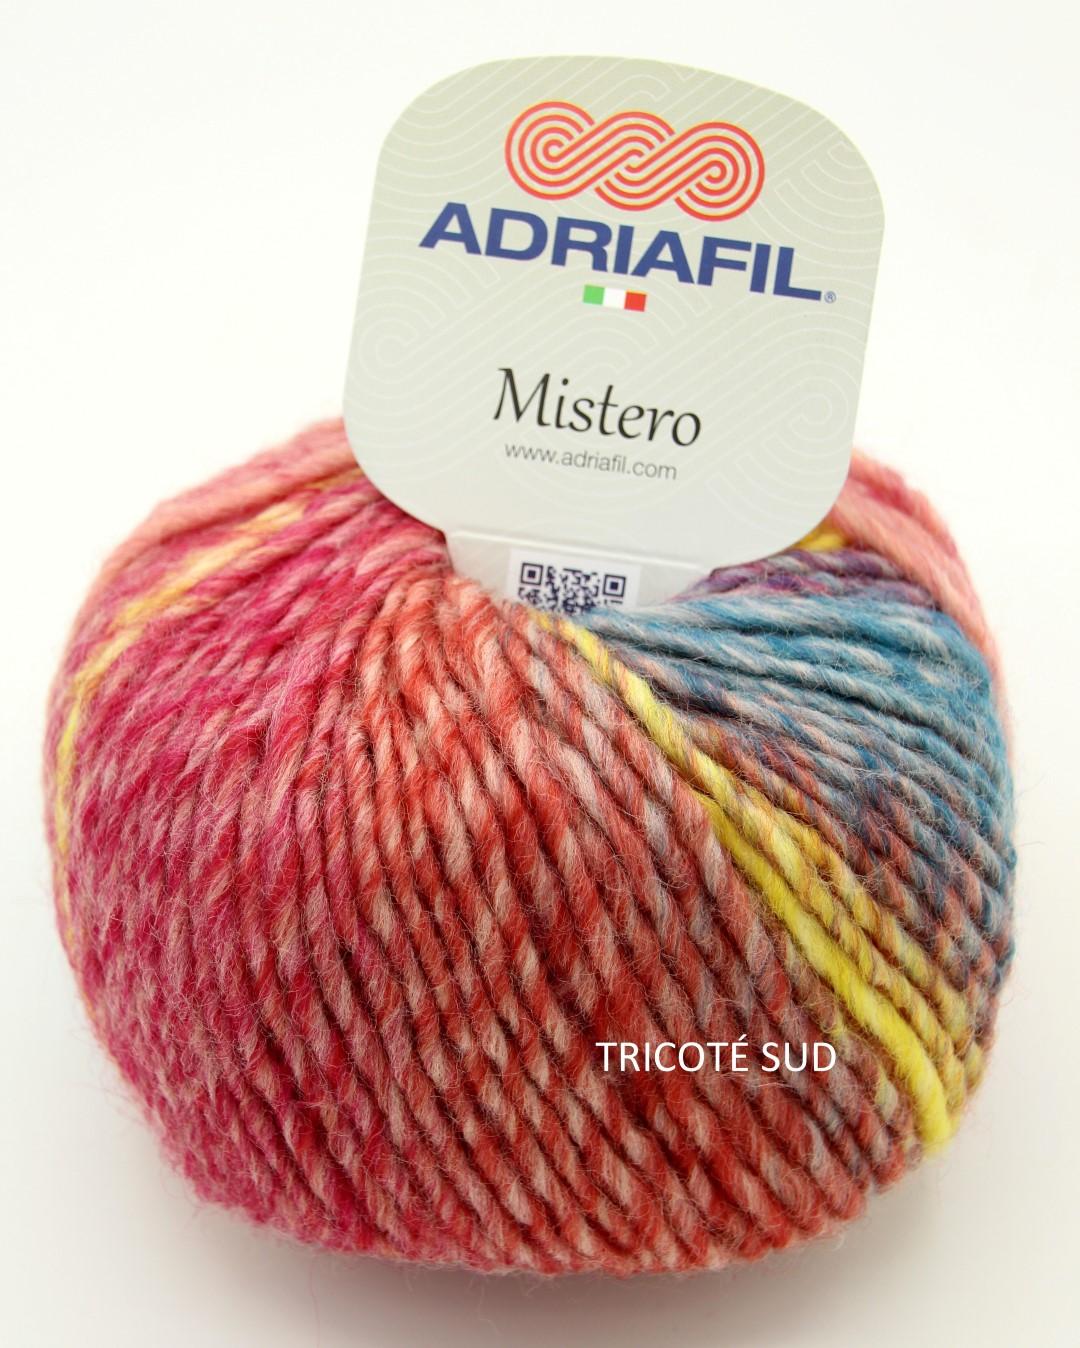 MISTERO ADRIAFIL COLORIS 68 (1) (Large)